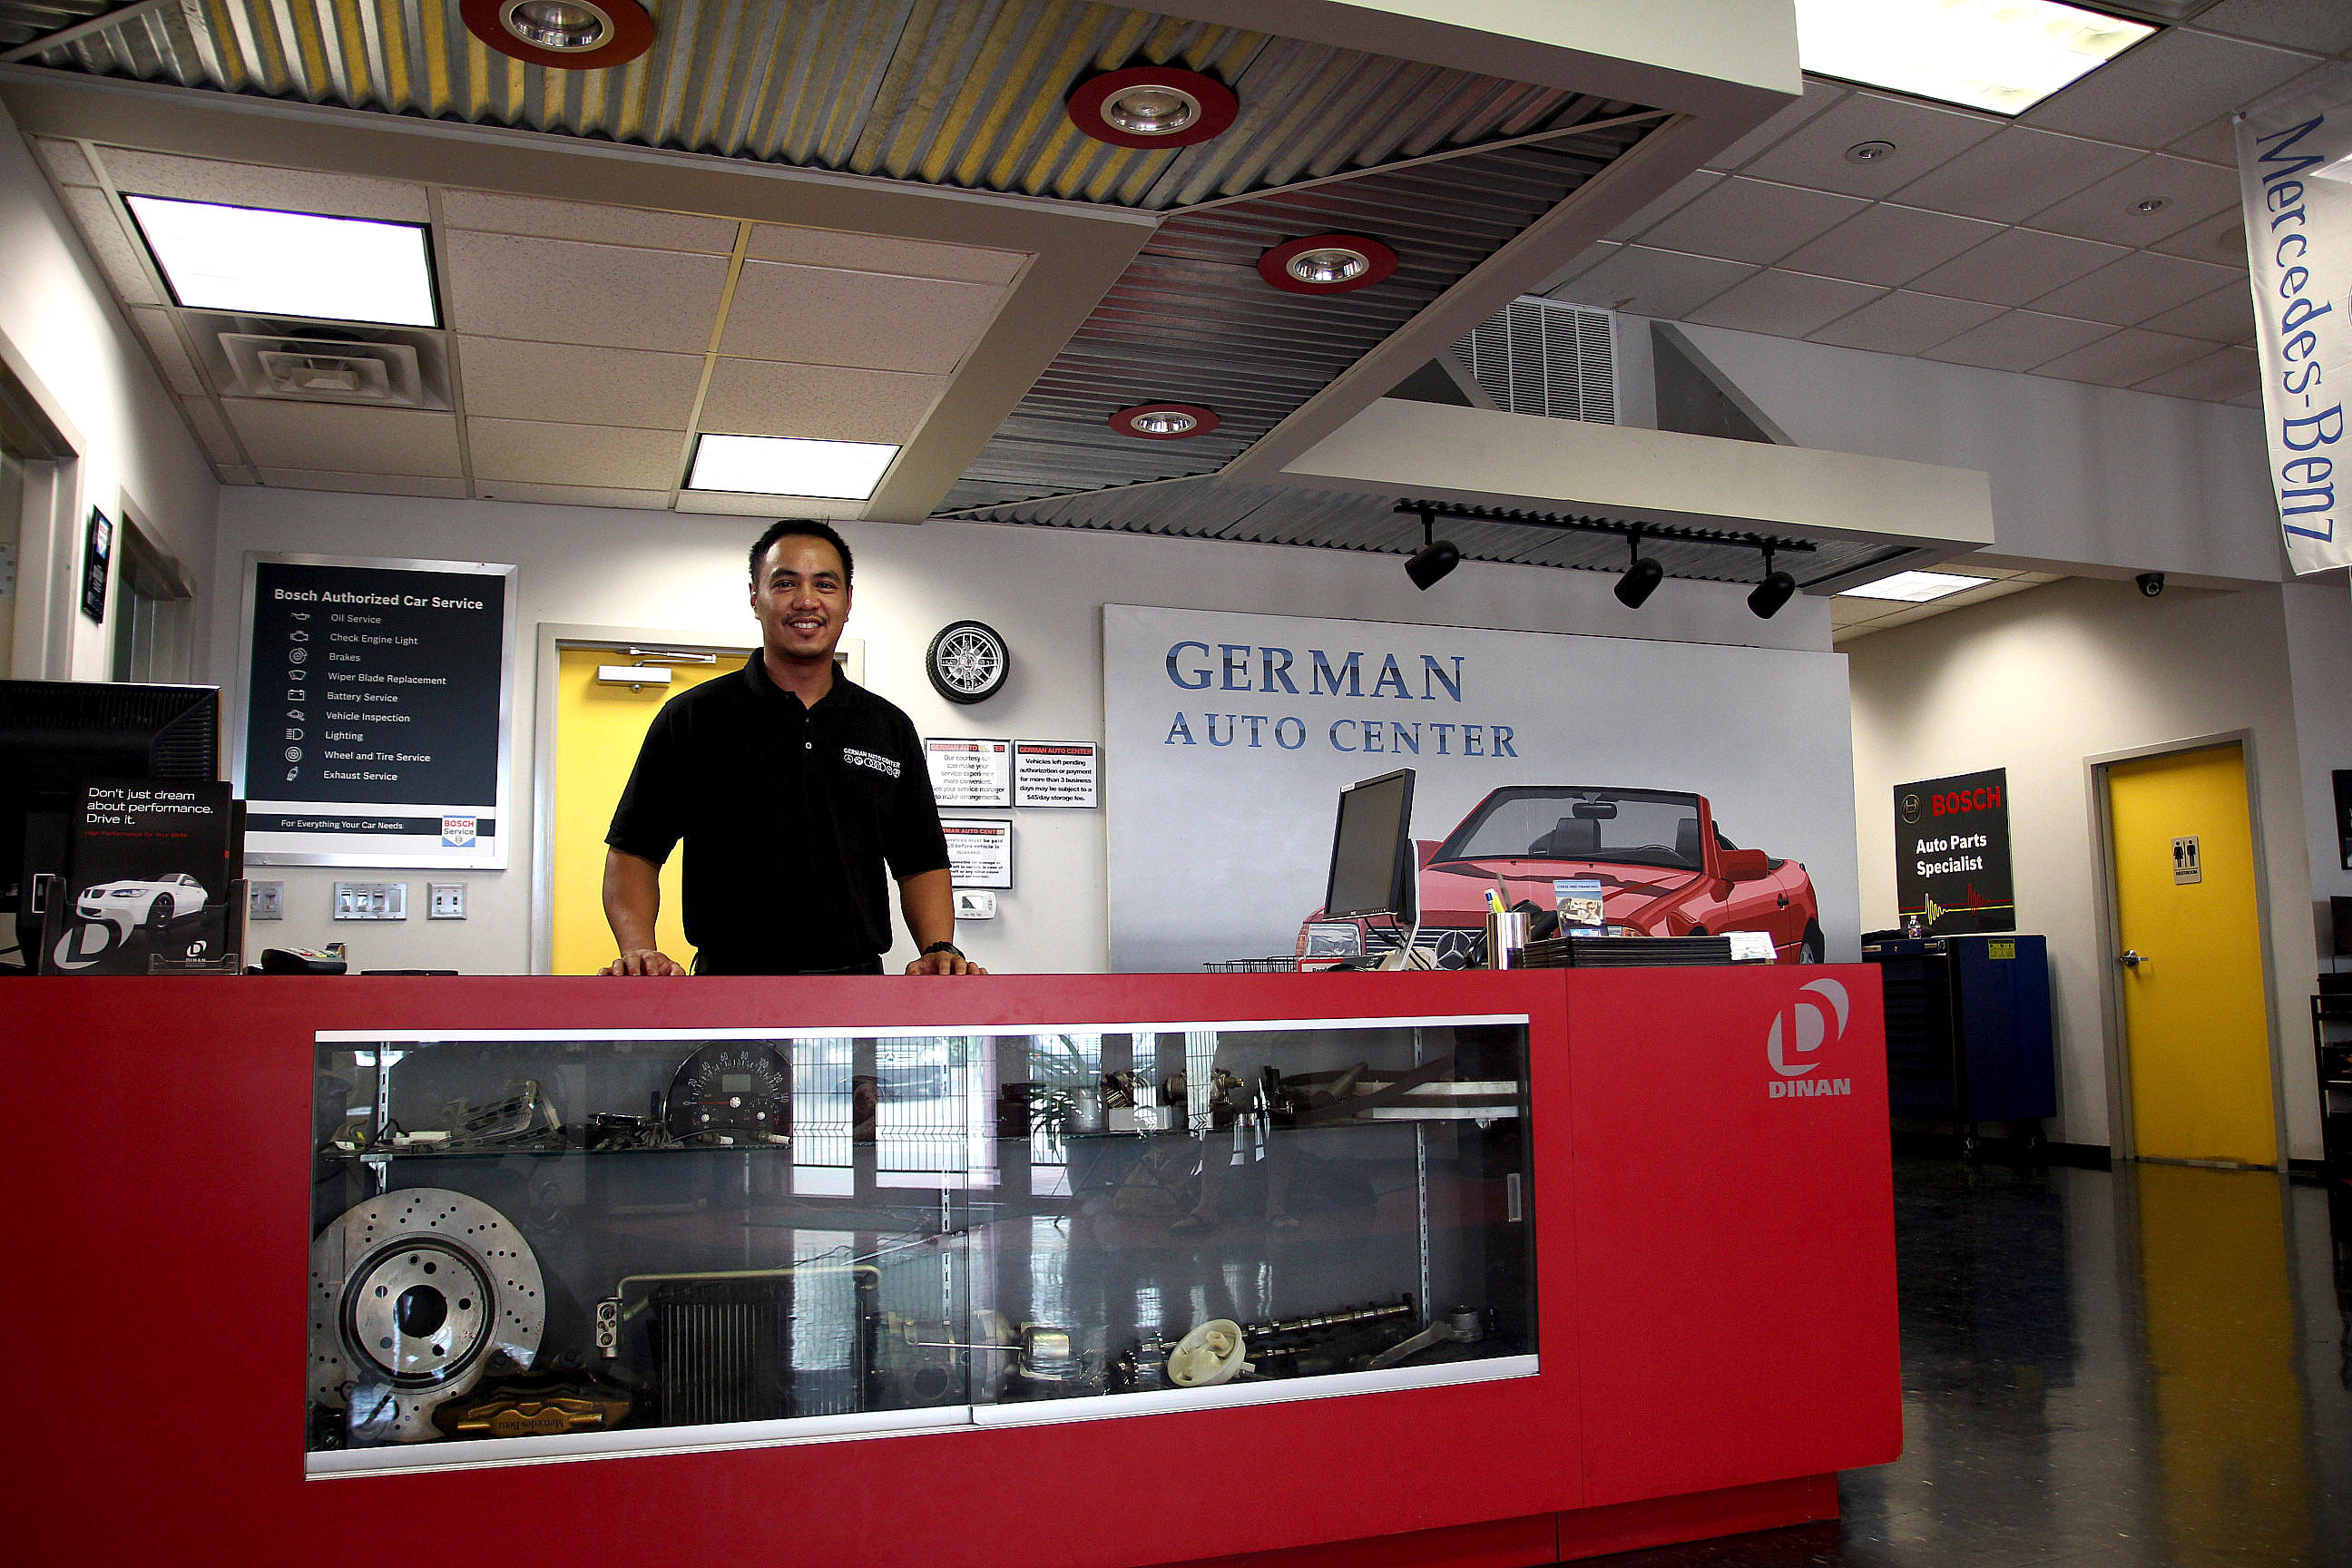 German Auto Center image 0